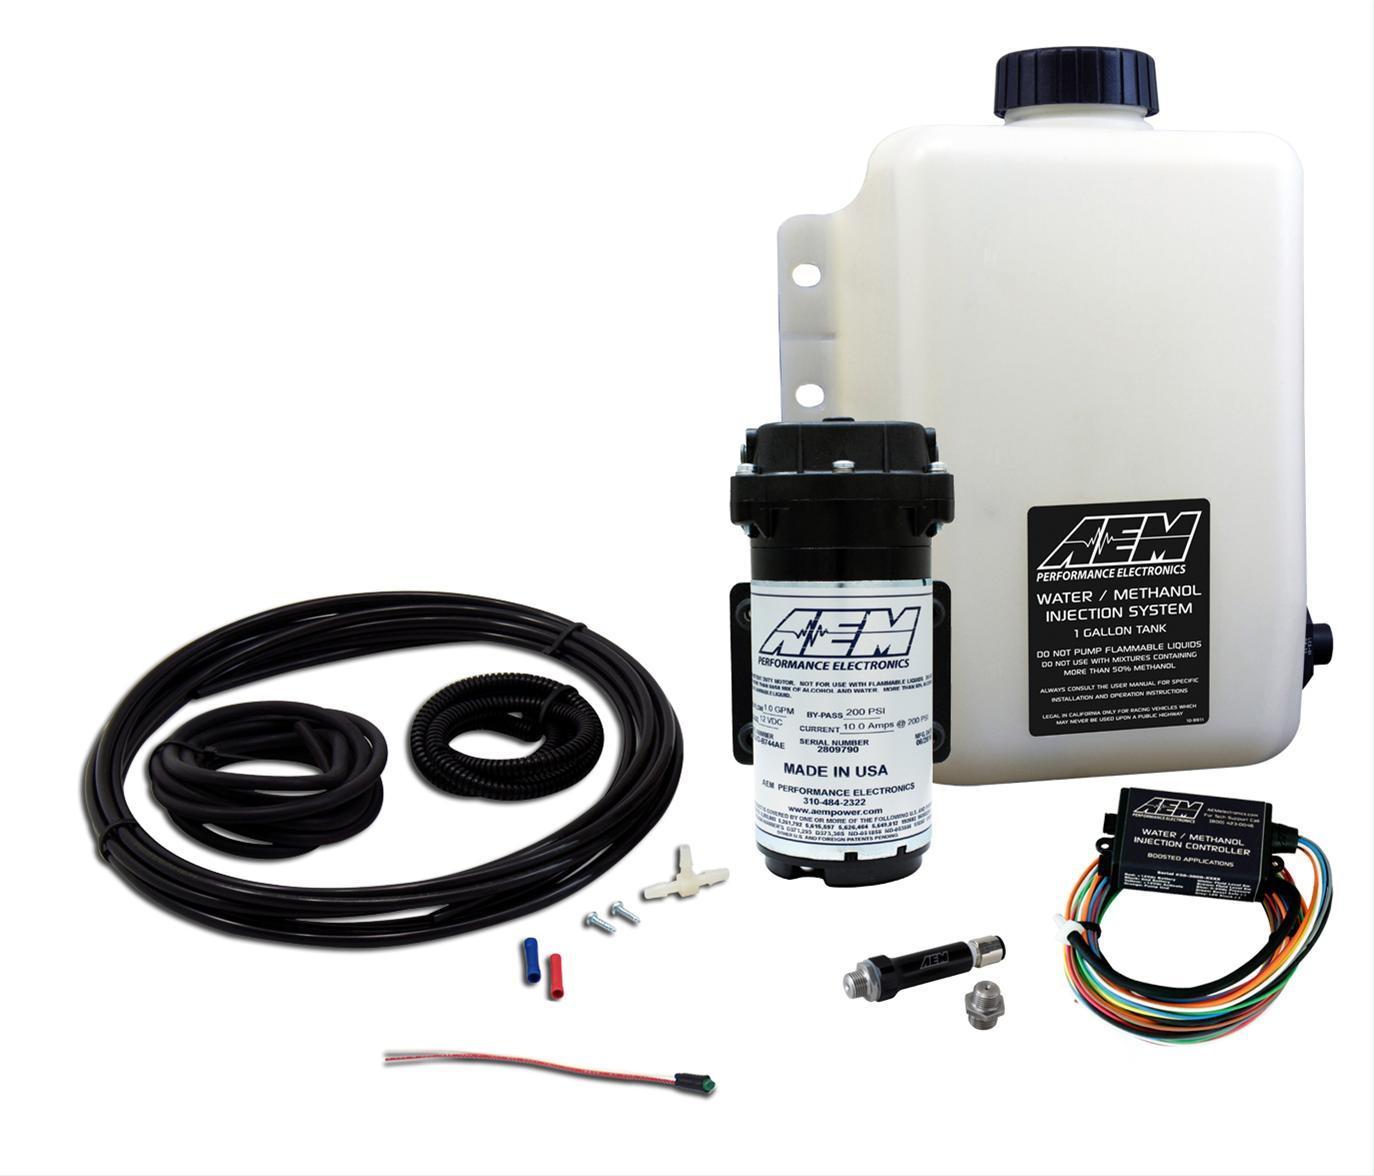 Aem 30 3000 1 gallon water methanol injection kit corvetteforum chevrolet corvette forum discussion